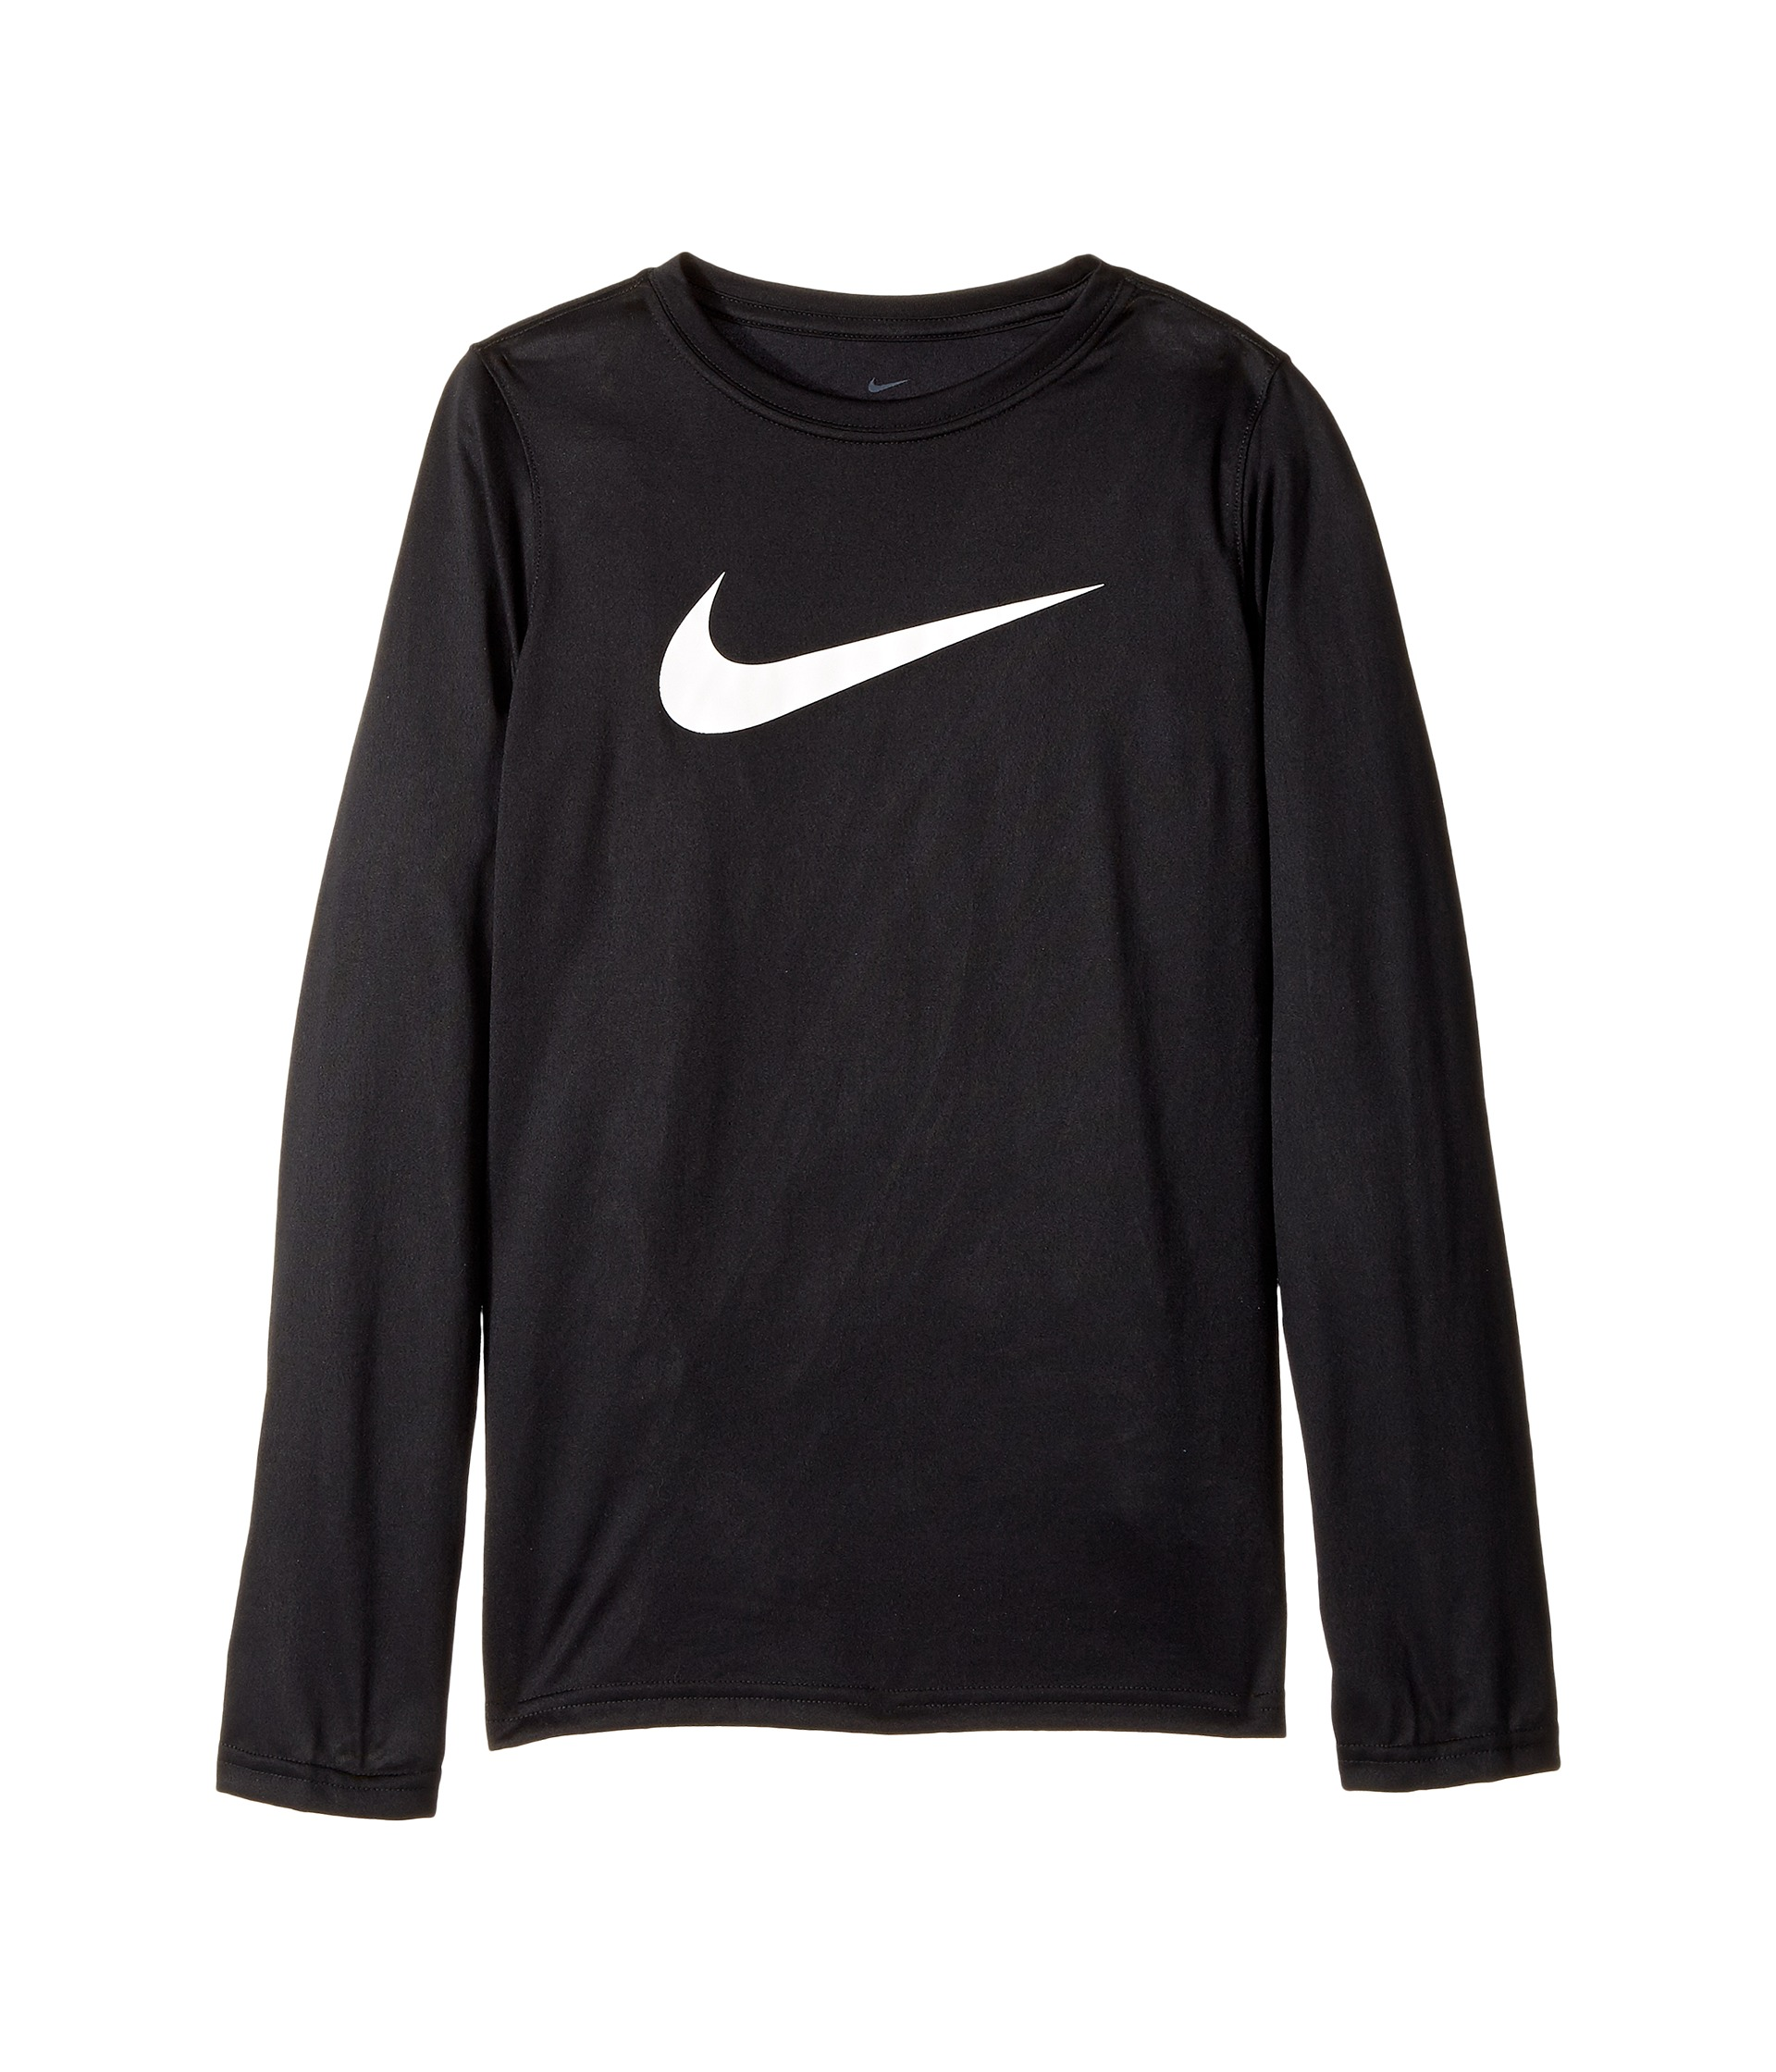 Nike Kids Dry Long Sleeve Training T-Shirt (Little Kids/Big Kids) at Zappos.com